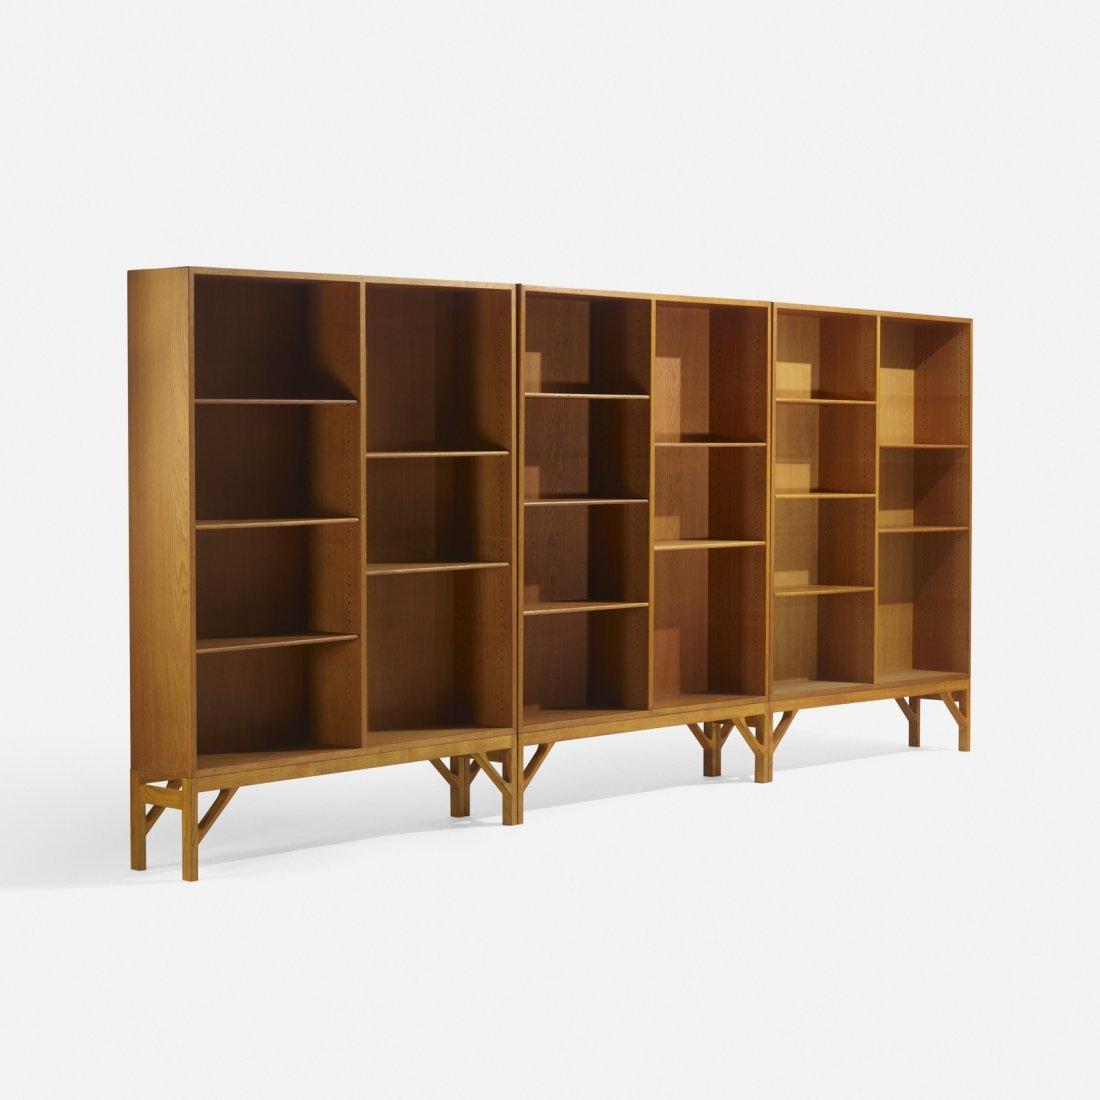 Borge Mogensen, bookcases, set of three